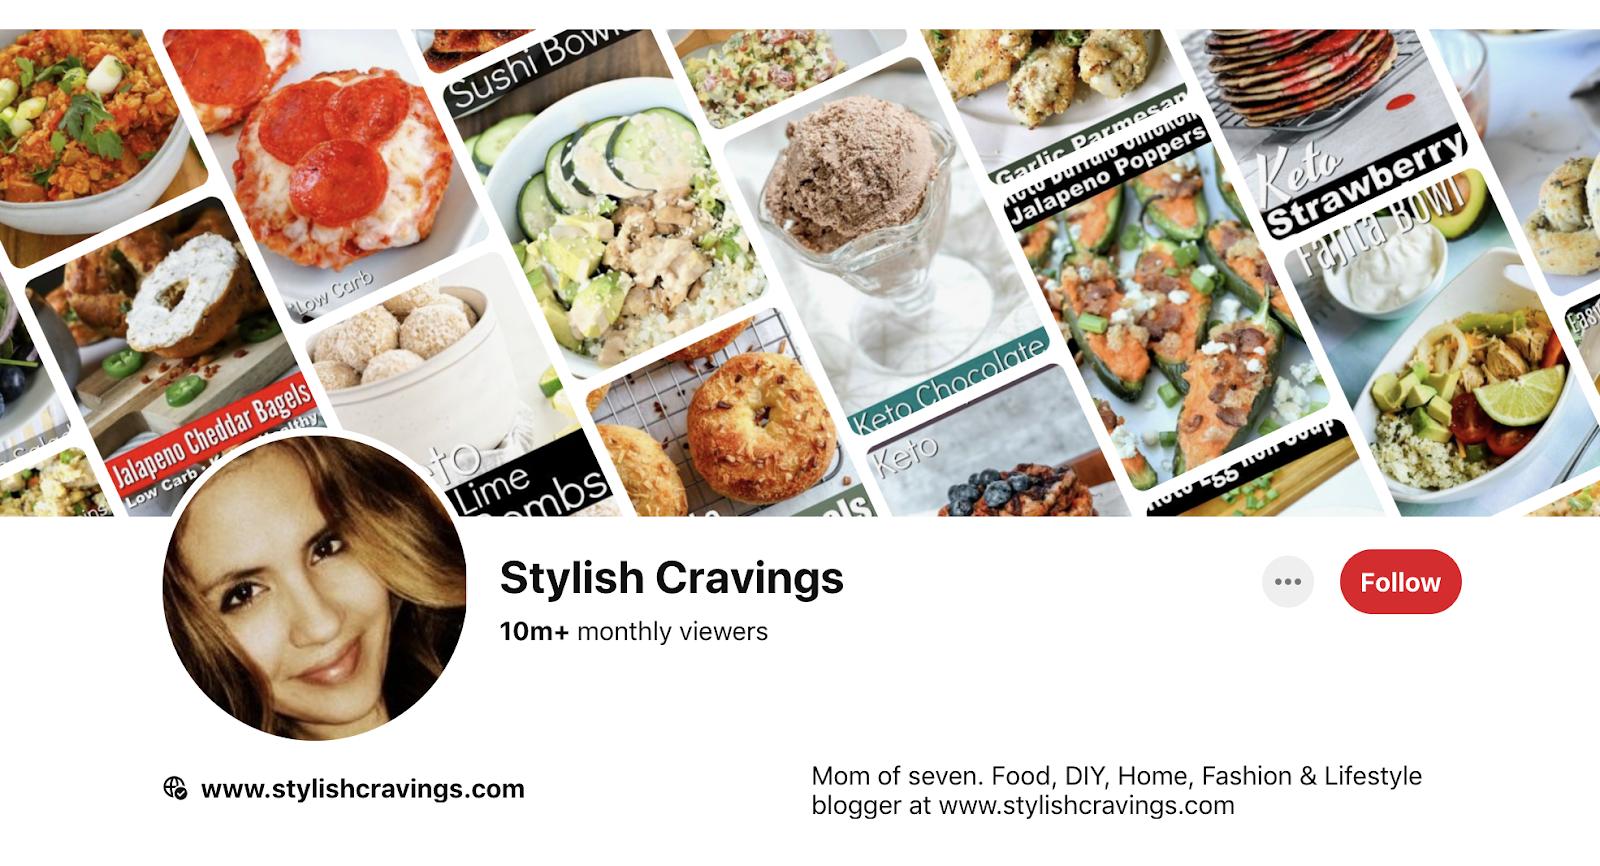 Stylish cravings